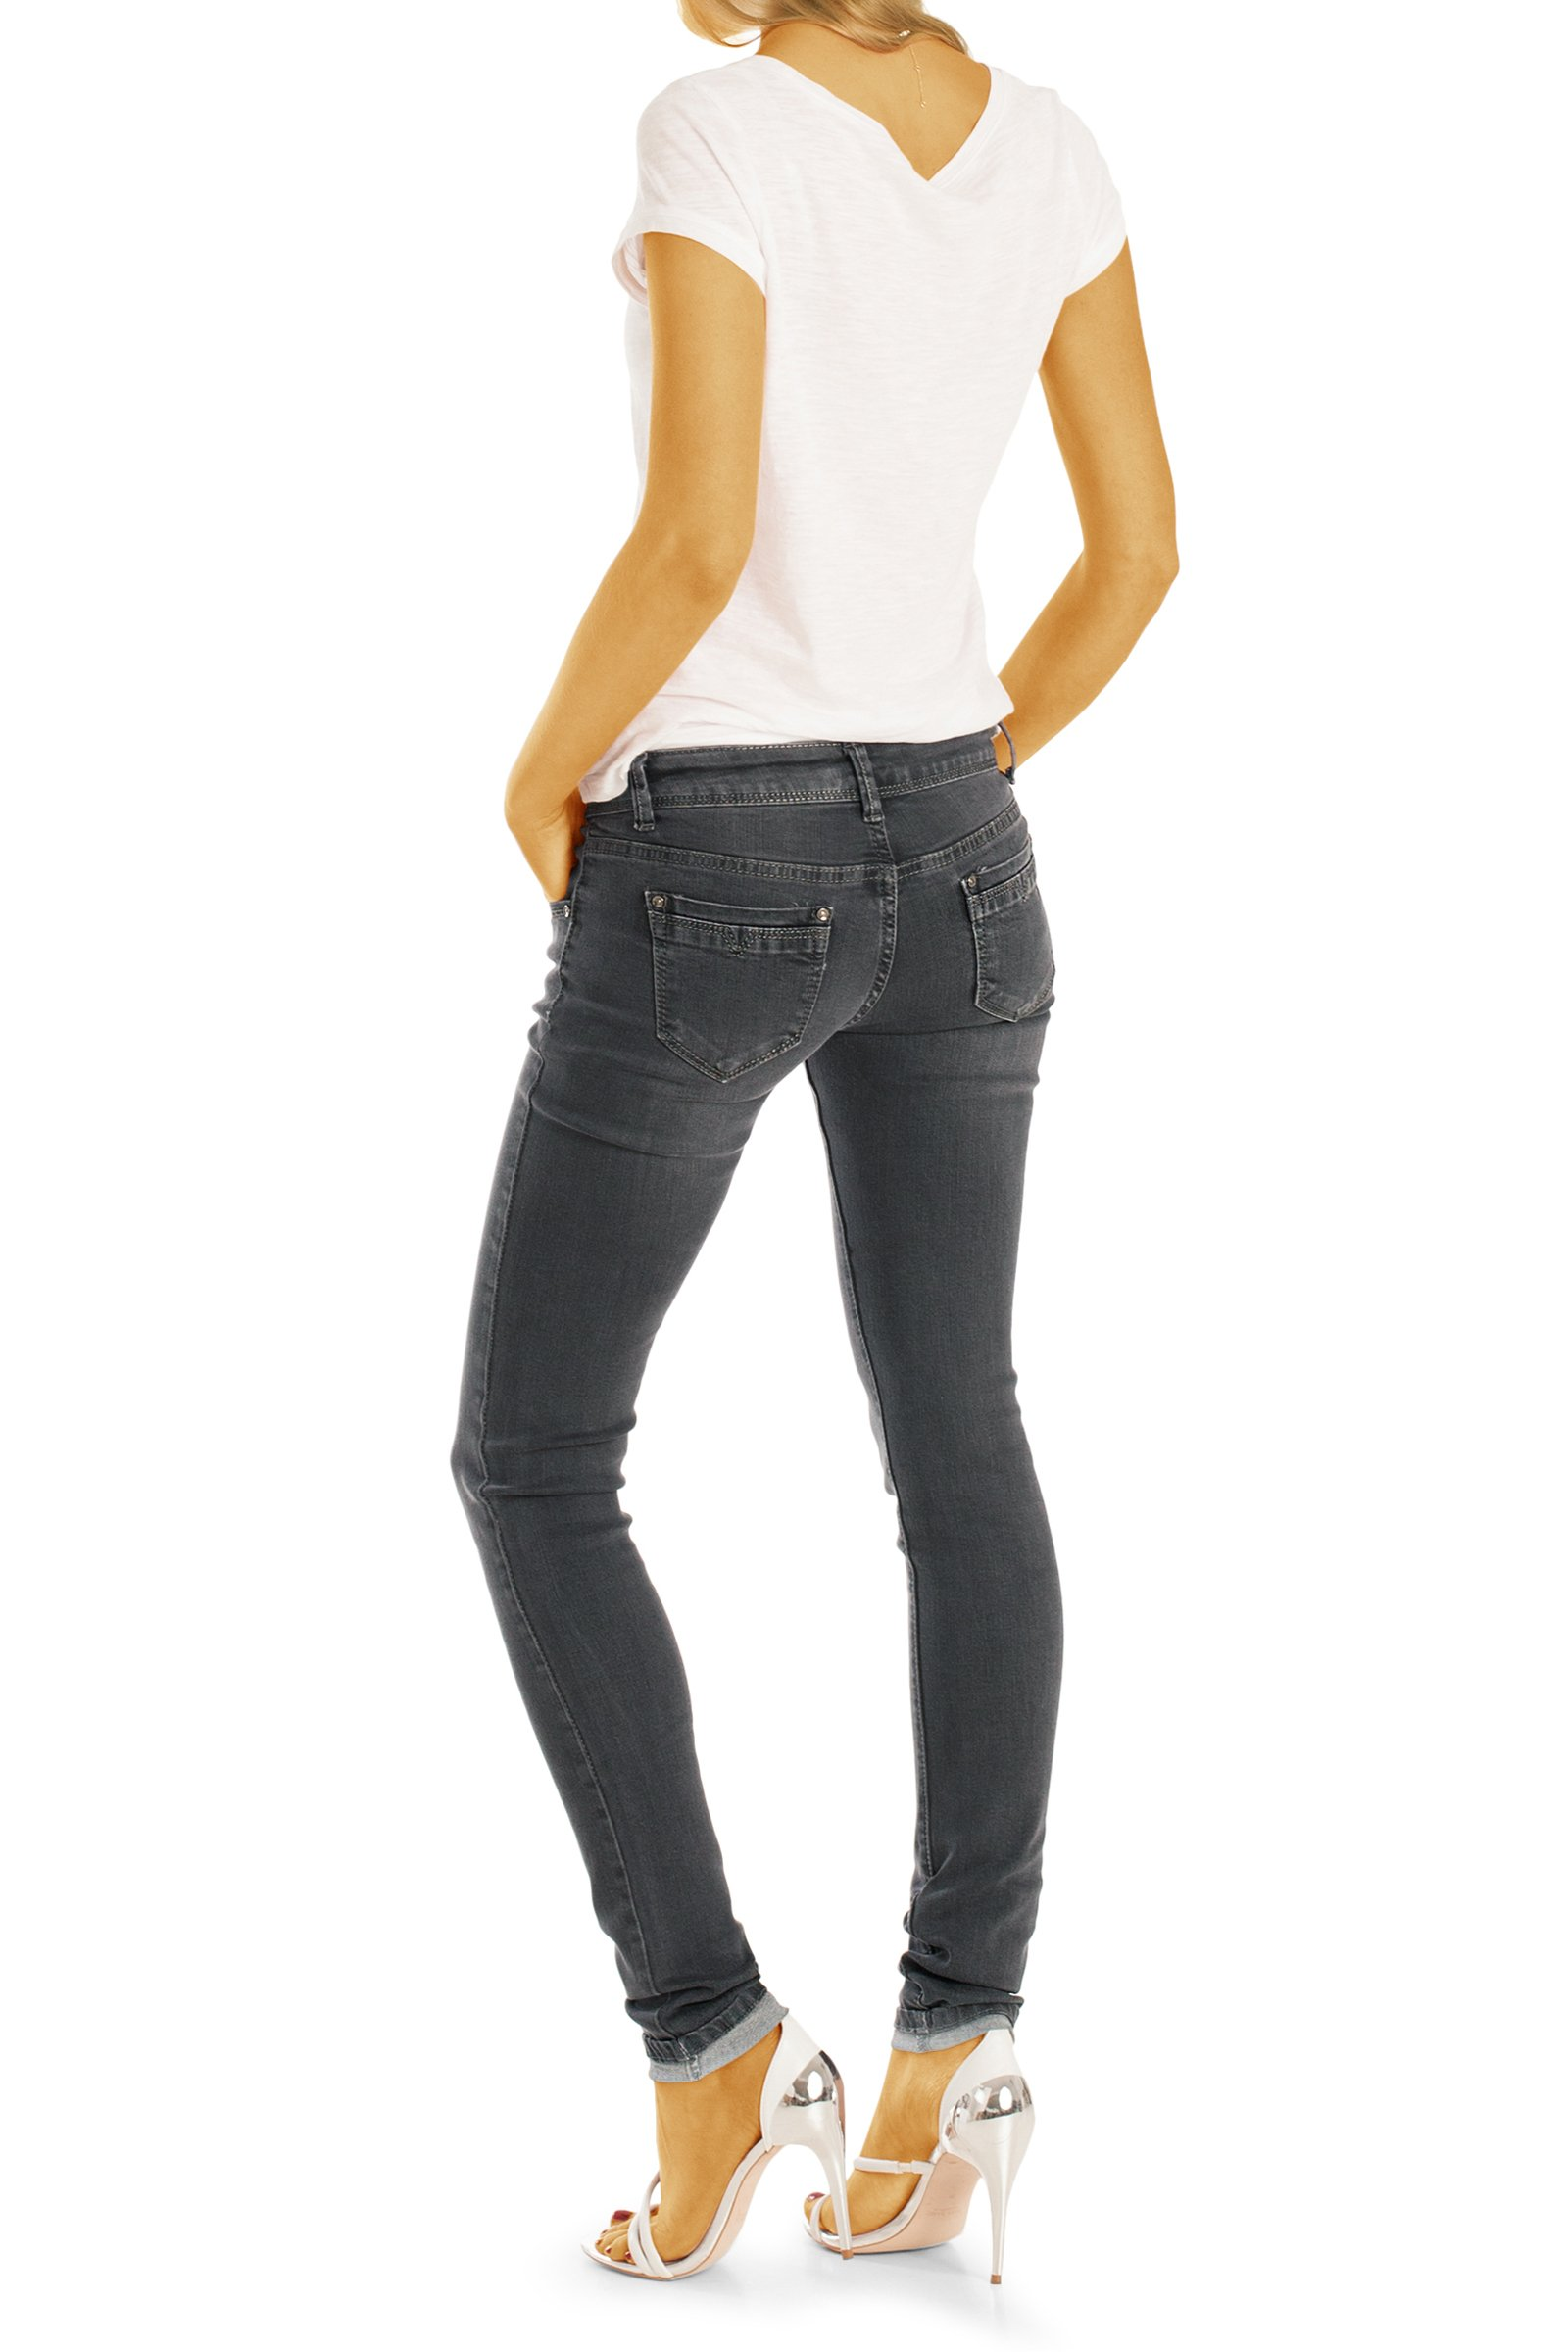 bestyledberlin Damen Röhrenjeans, Enge Stretch Jeans, Basic Skinny Hüftjeans j14l